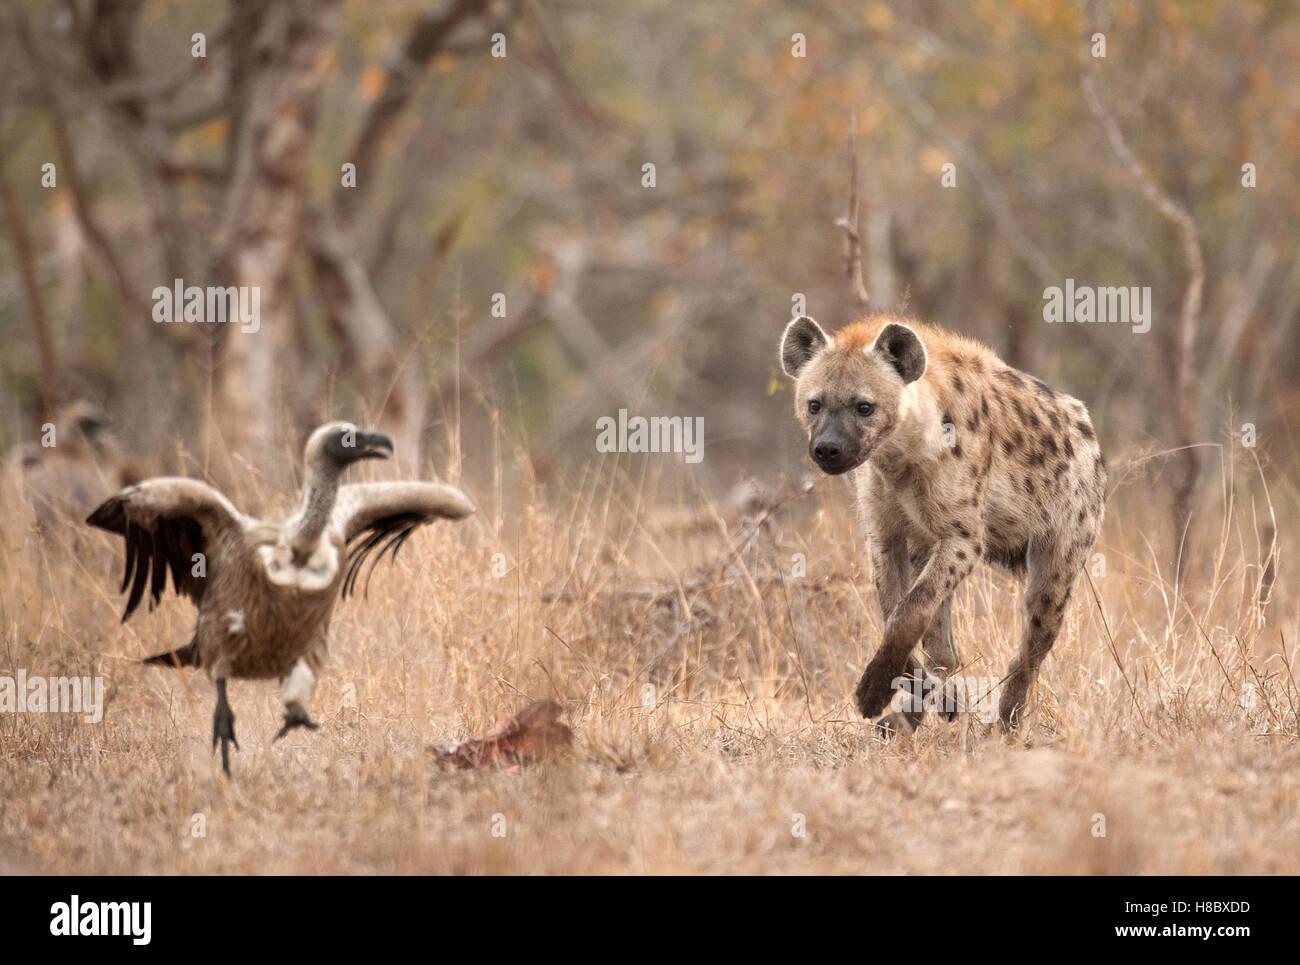 Manchada de hyaena persiguiendo buitre Imagen De Stock